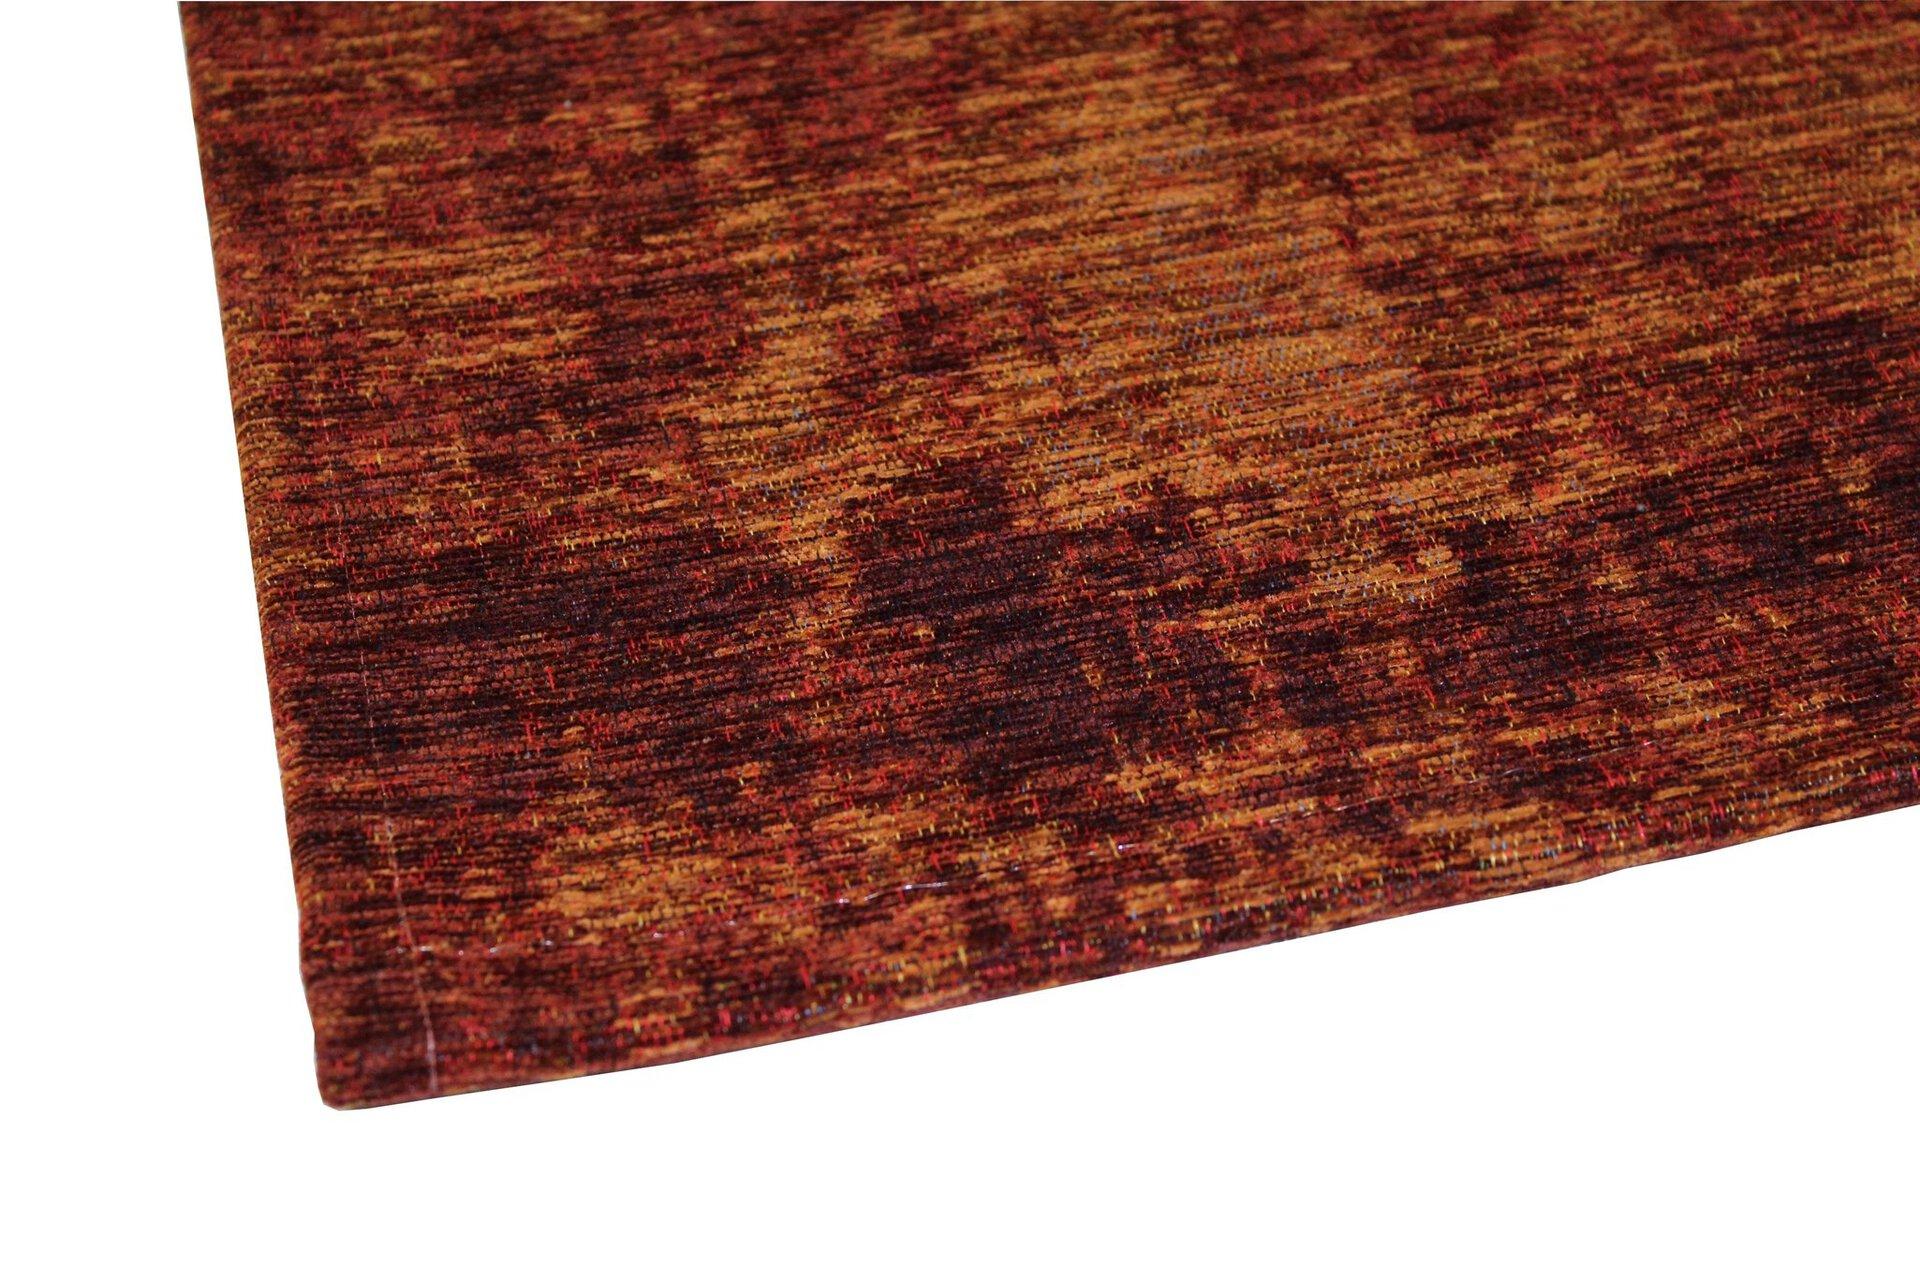 Maschinenwebteppich Saragoza DEKOWE Textil 68 x 120 cm